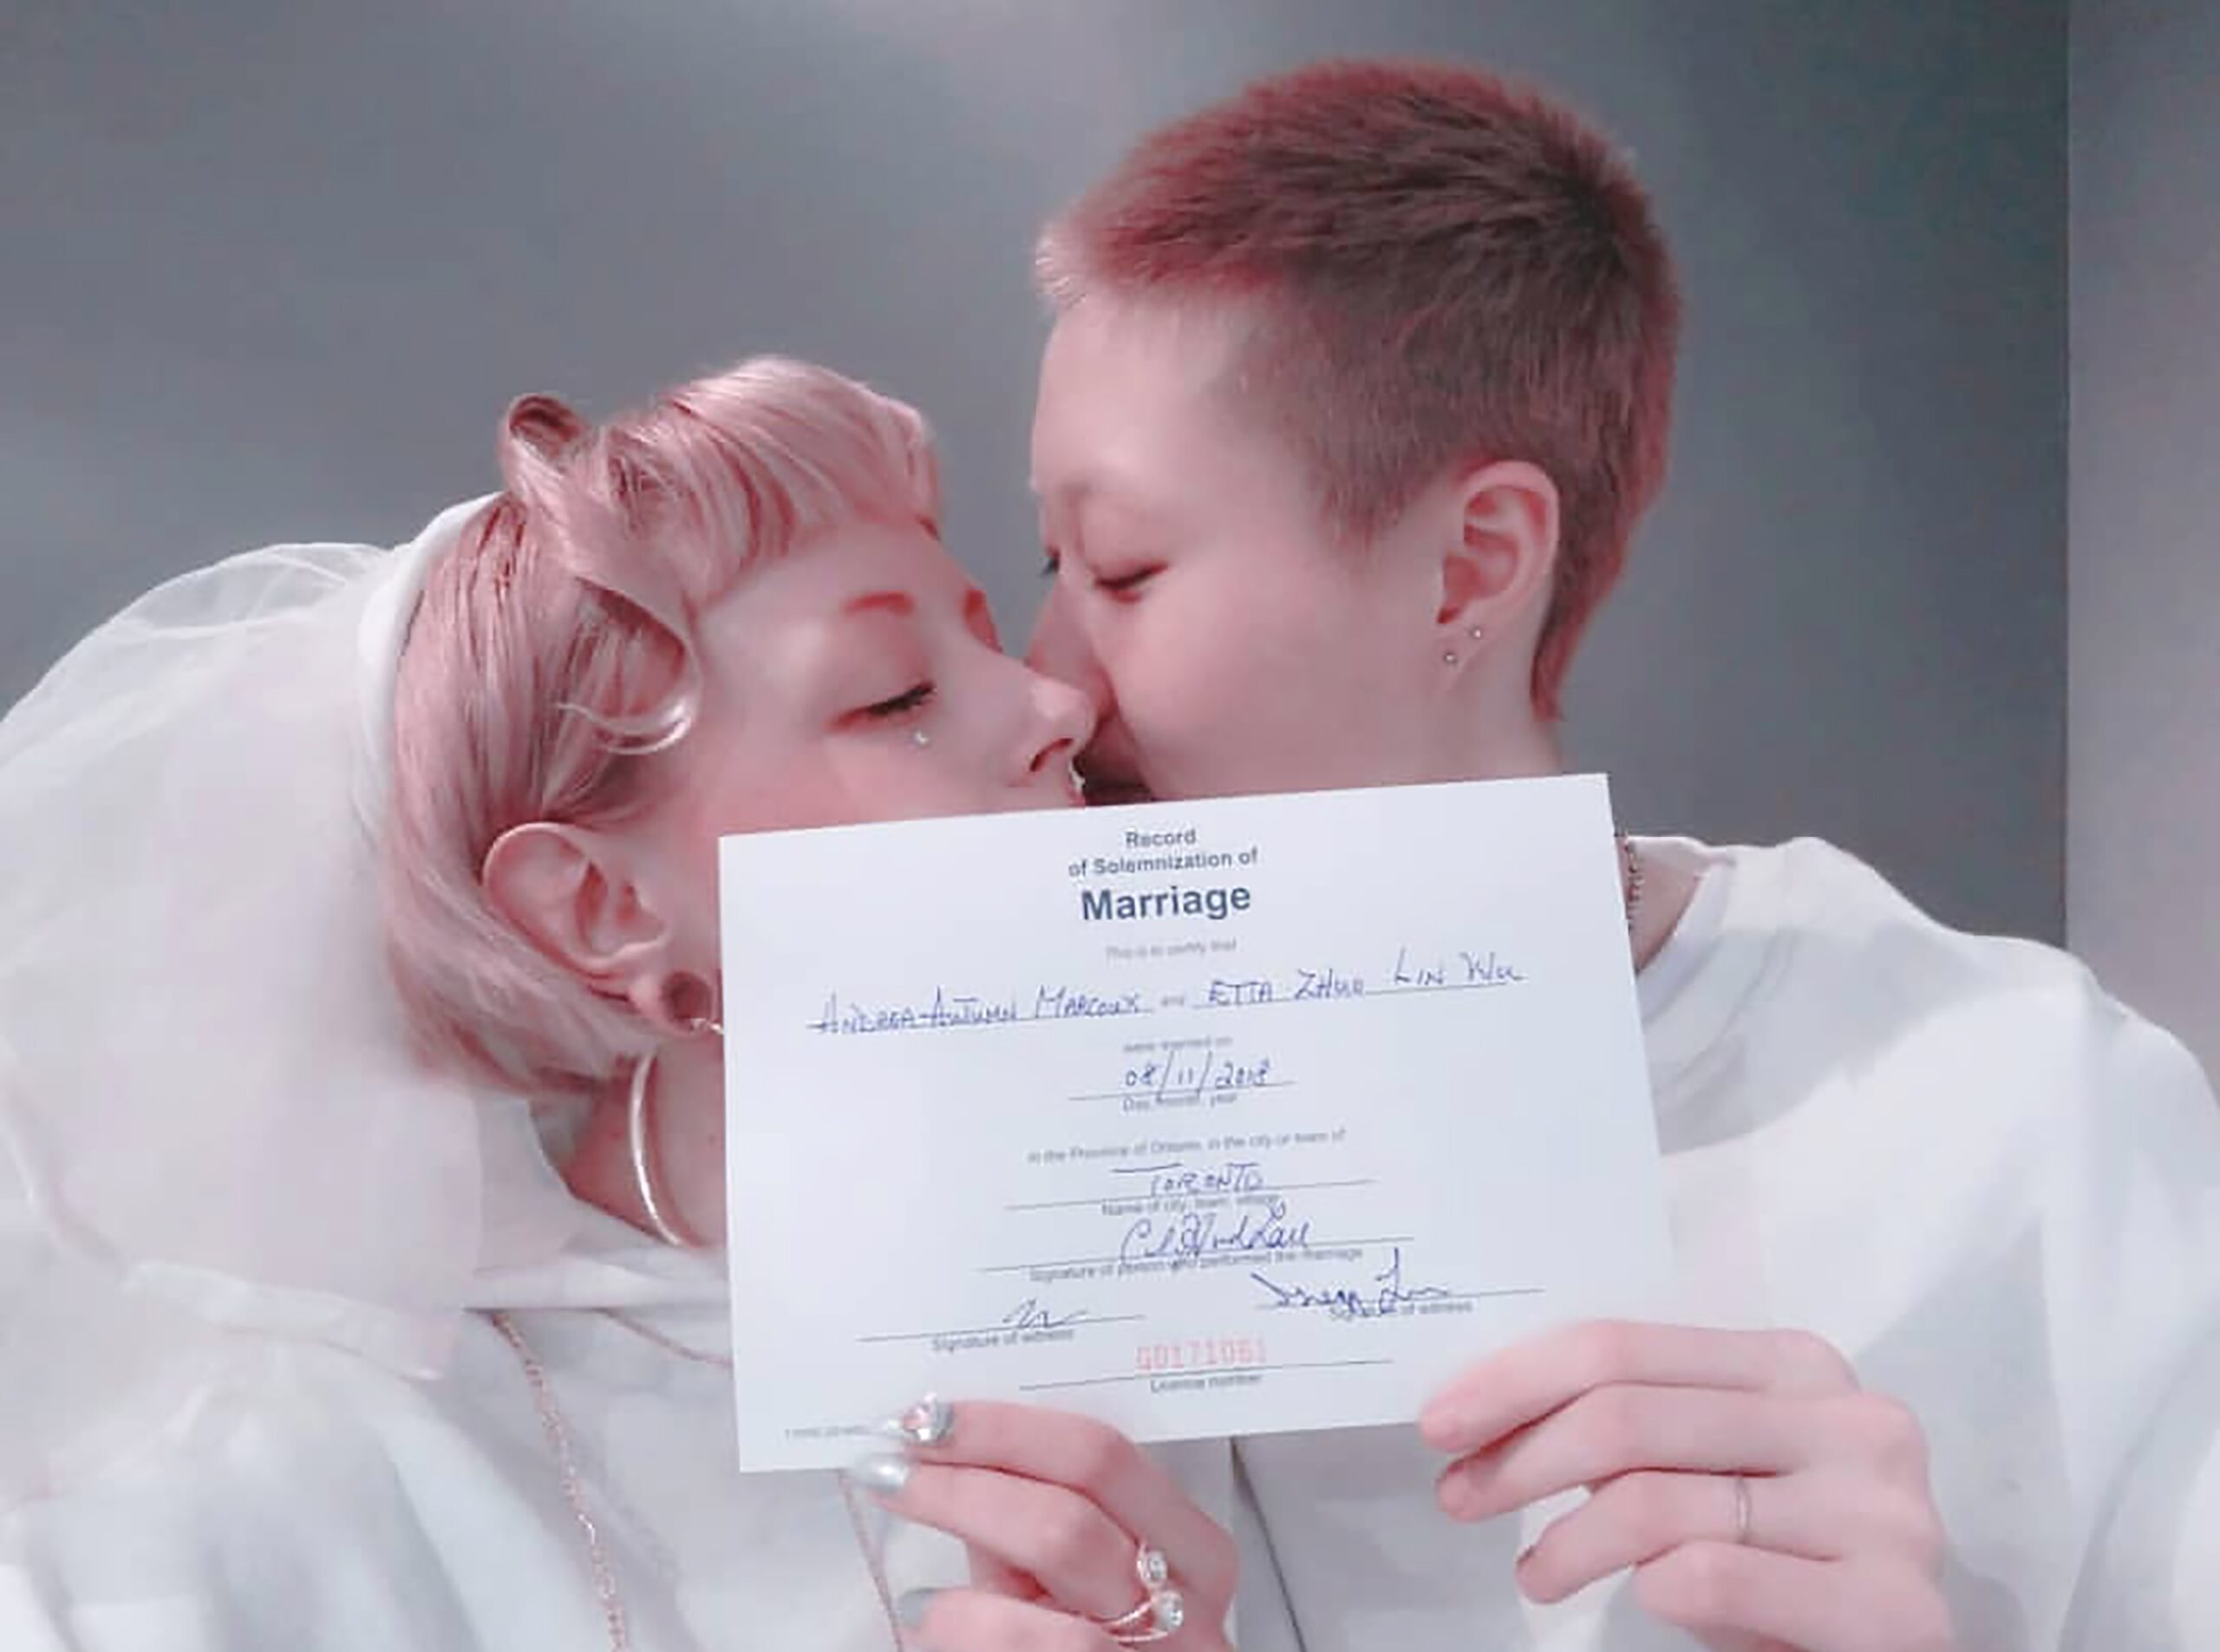 Etta Ng Chok Lam marries Andi Autumn